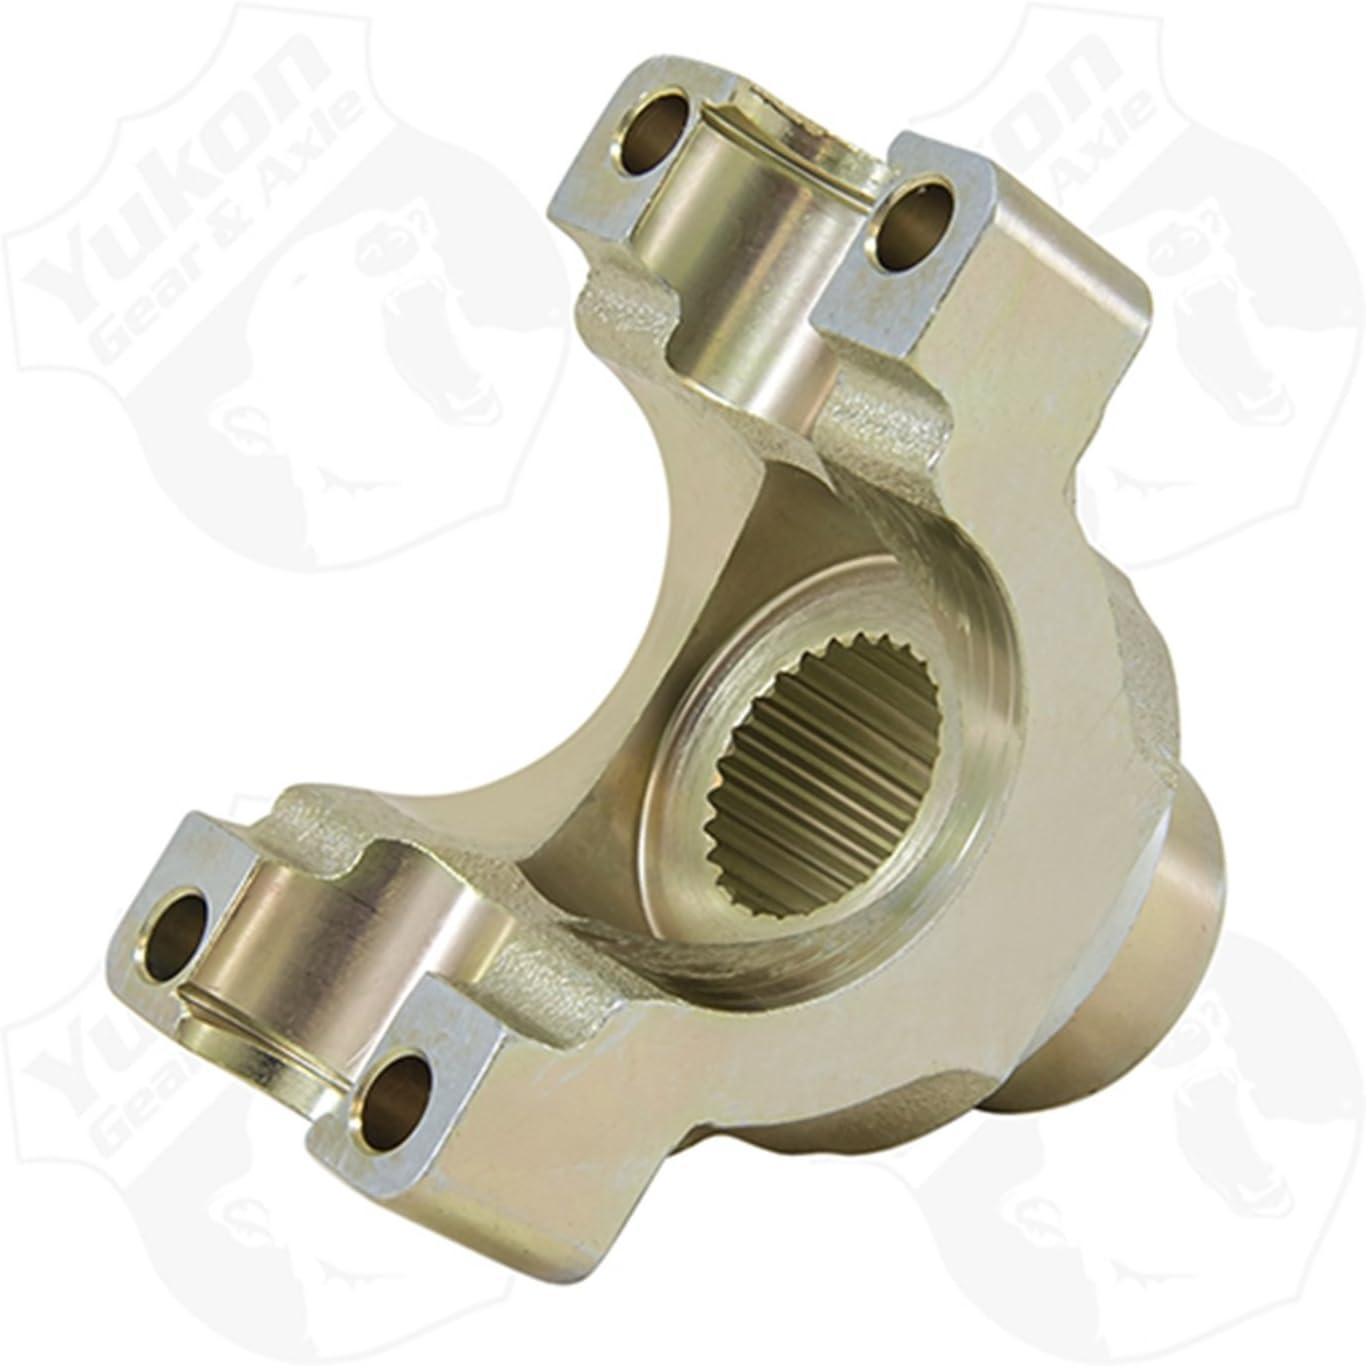 5 Flexible Shaft 1 Phase 9 Amp Motor OZTEC 1.2MK-FS05MK-F-H150MK-F Mikasa Type Concrete Vibrator AC//DC 1-1//2 Diameter Head